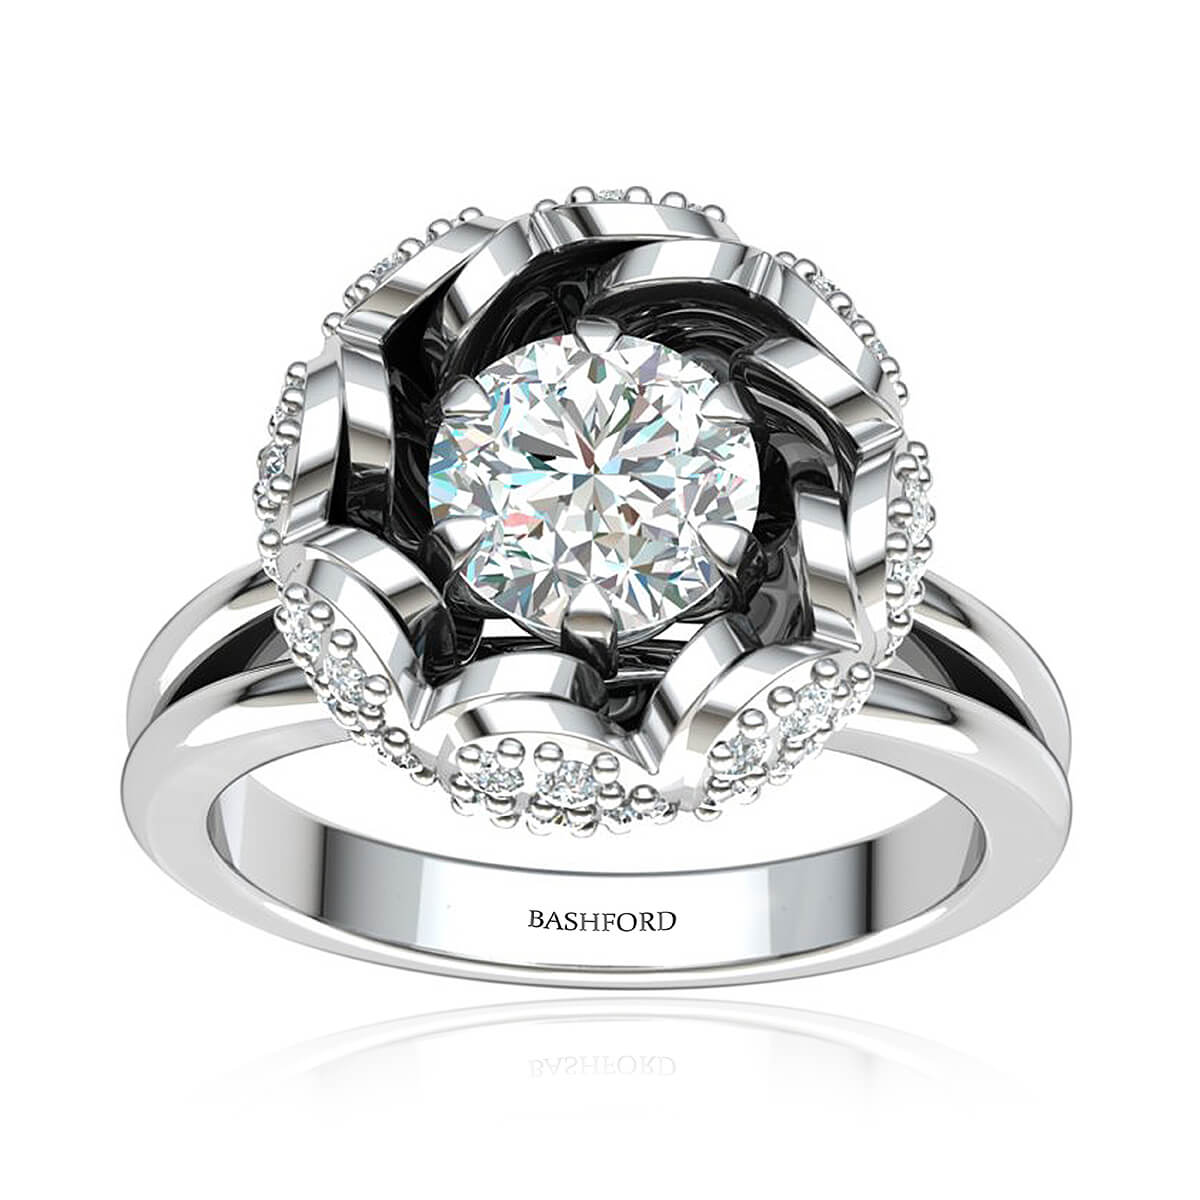 The Camellia Diamond Ring